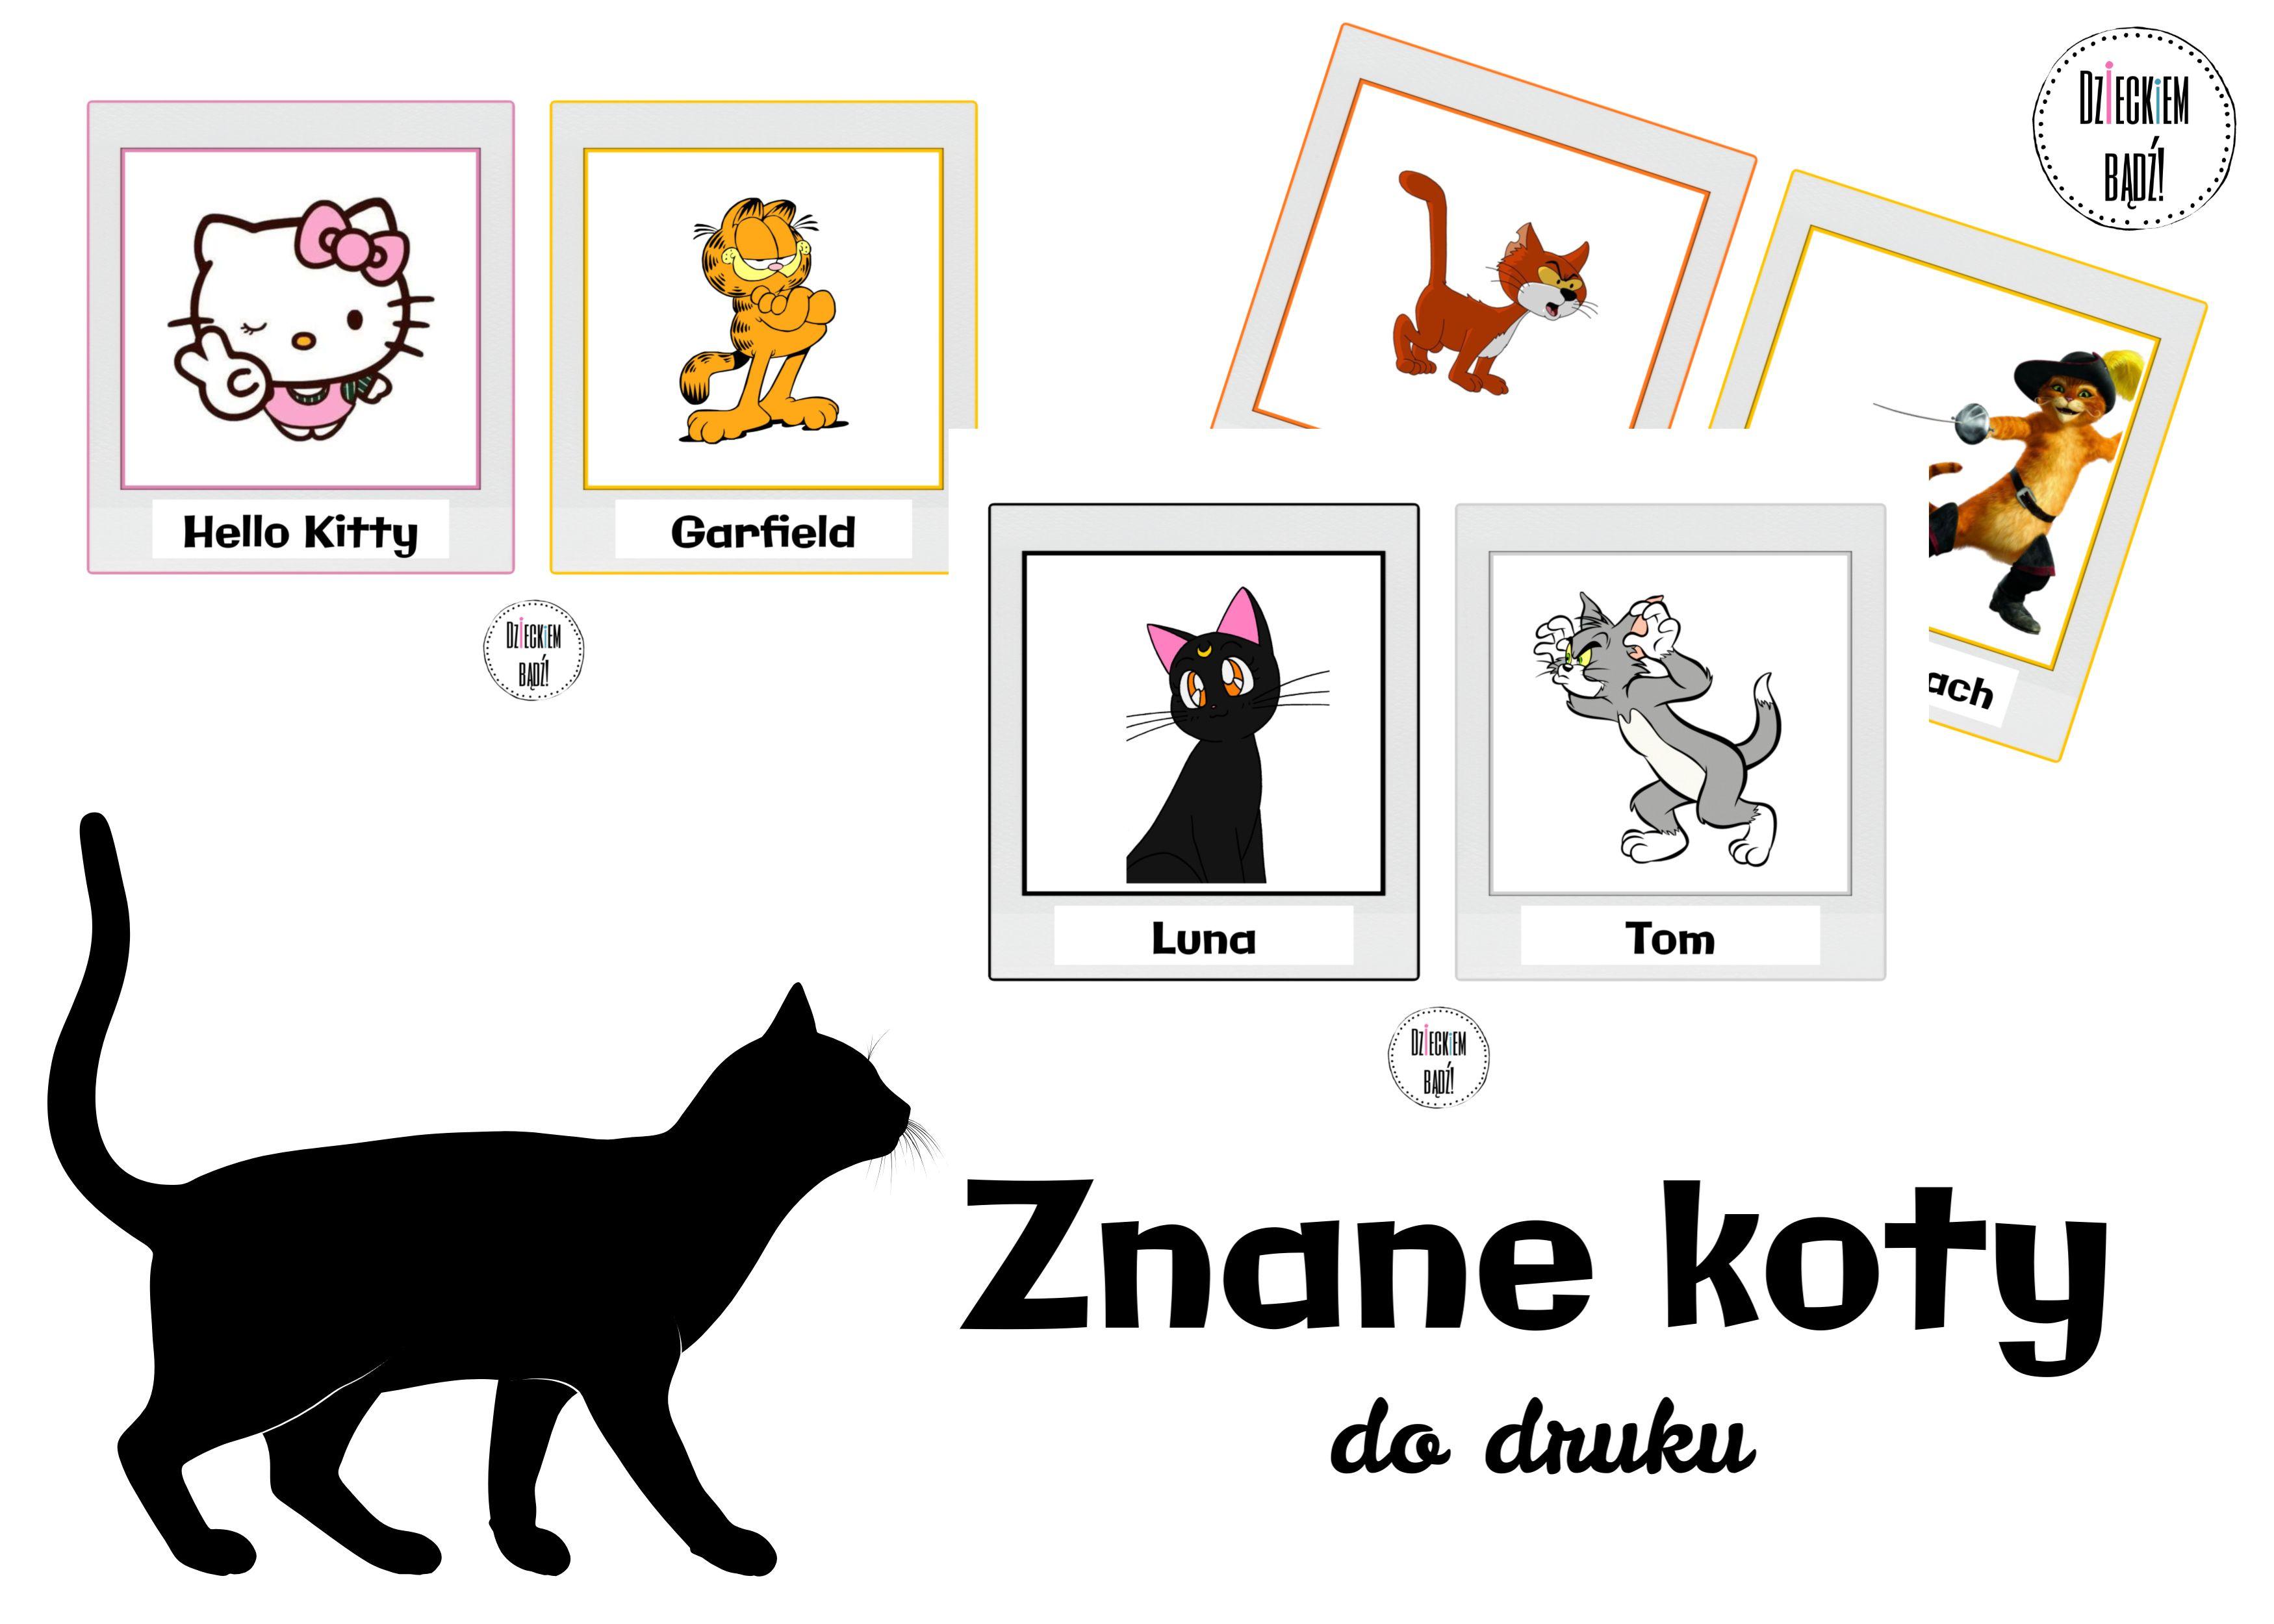 Znane Koty Slawne Koty In 2020 Kitty Gallery Wall Hello Kitty